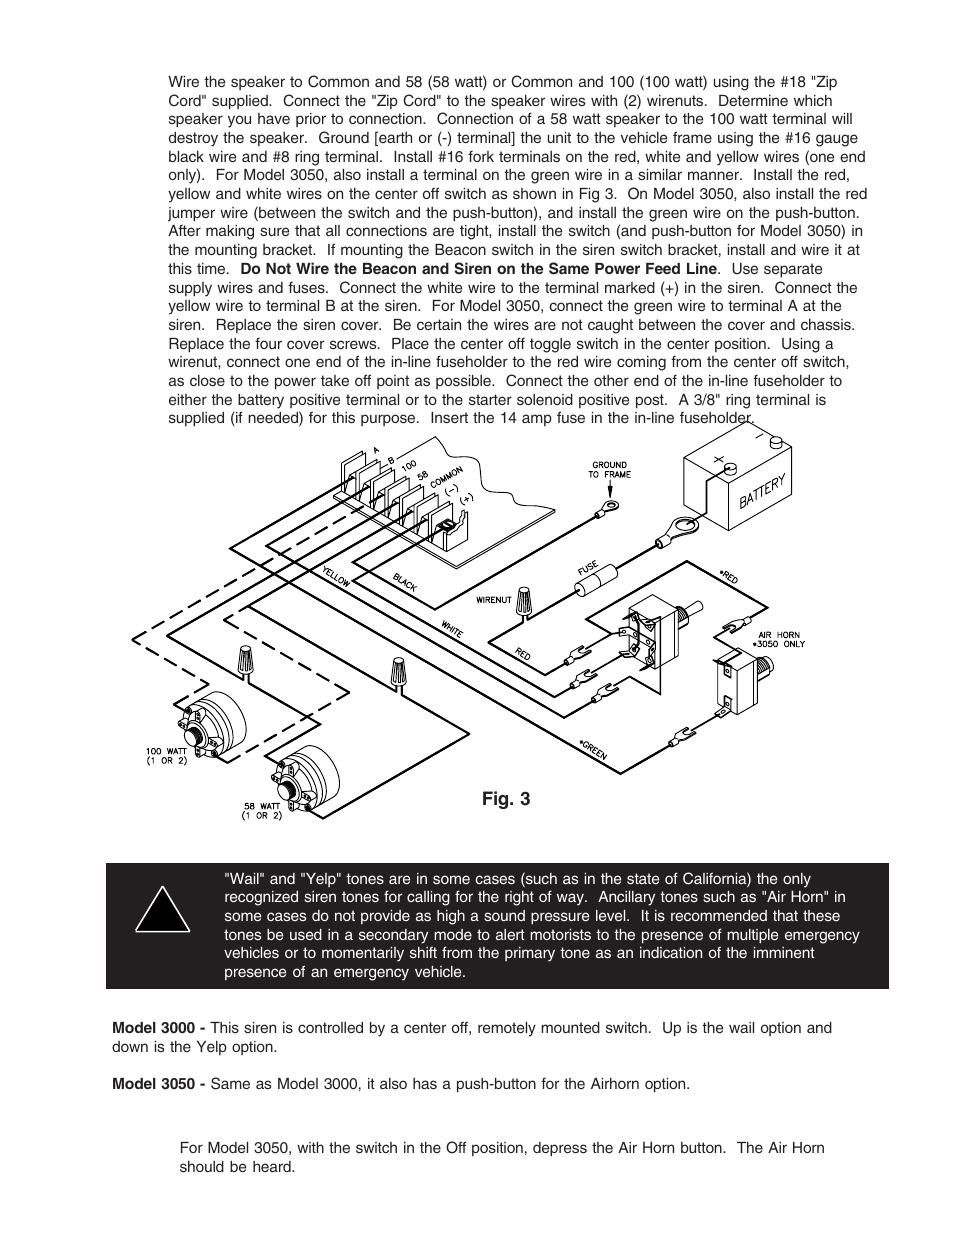 Code 3 2100 Lightbar Wiring Diagram from www.manualsdir.com